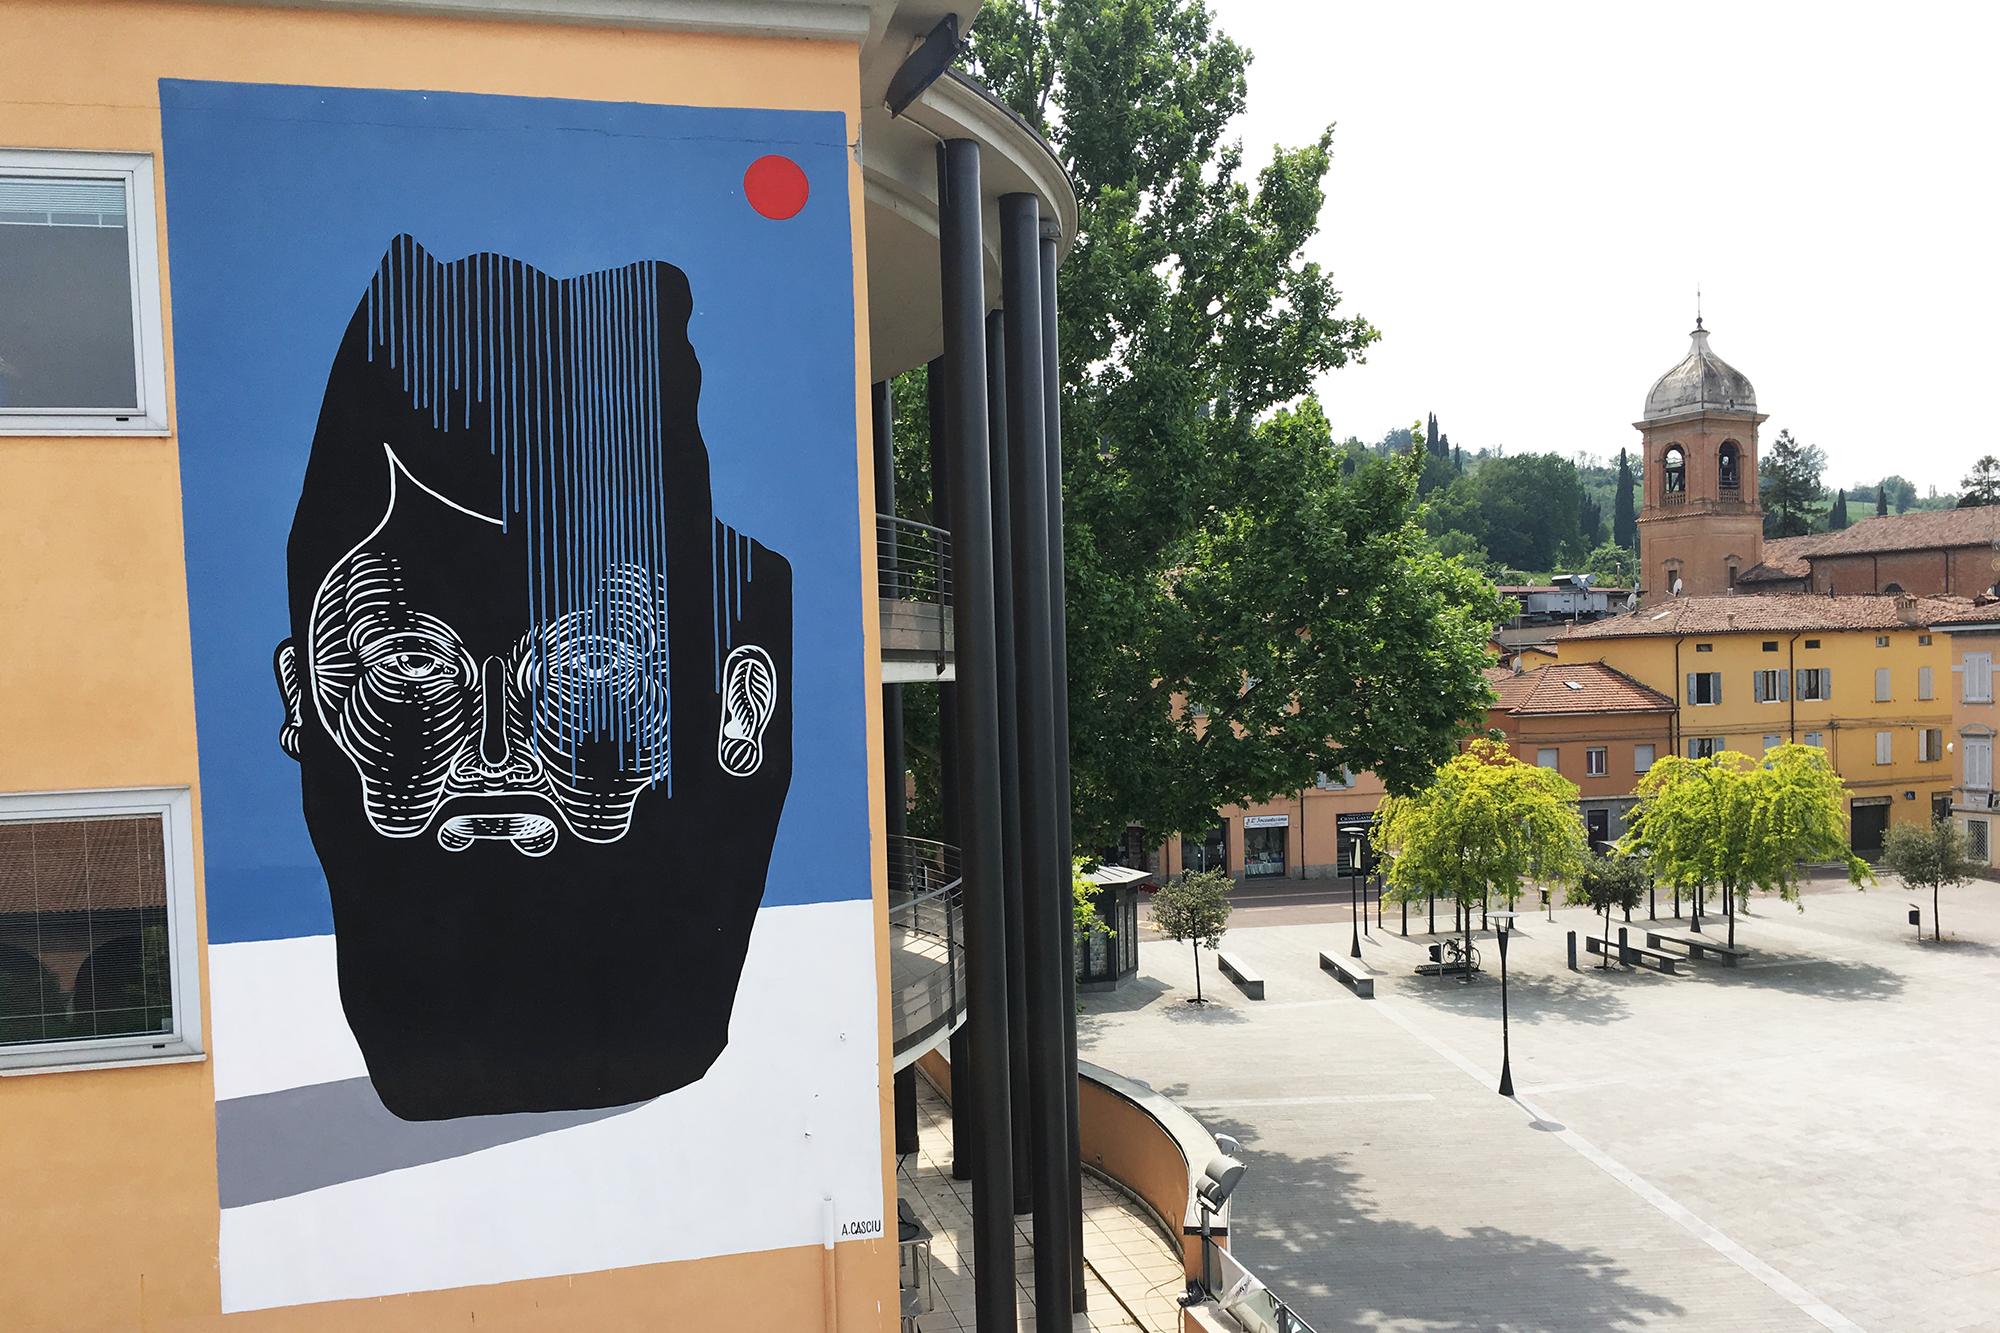 Andrea Casciu Fiorano Modenese Street Art